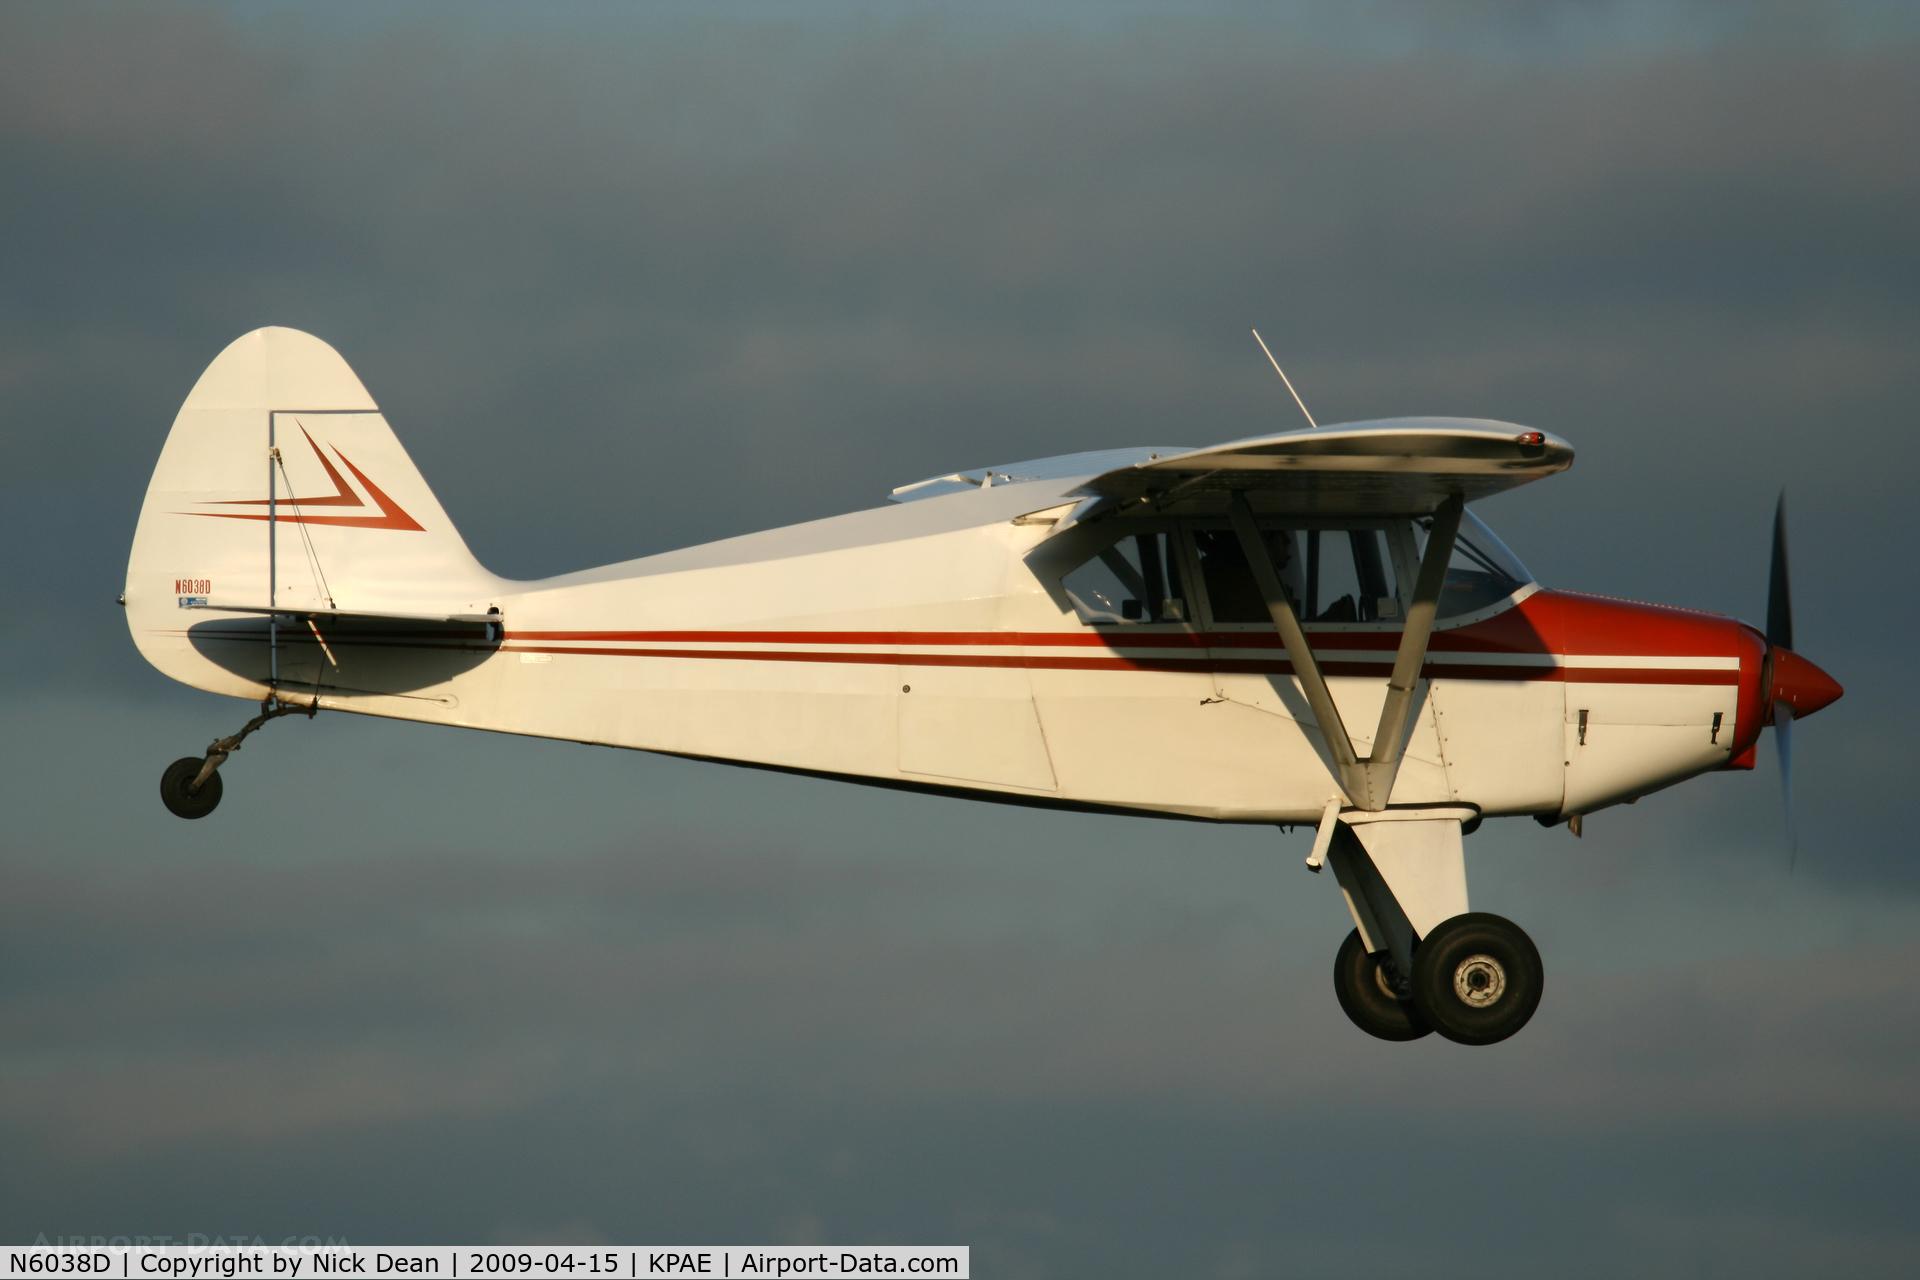 N6038D, 1956 Piper PA-22-150 C/N 22-4691, KPAE